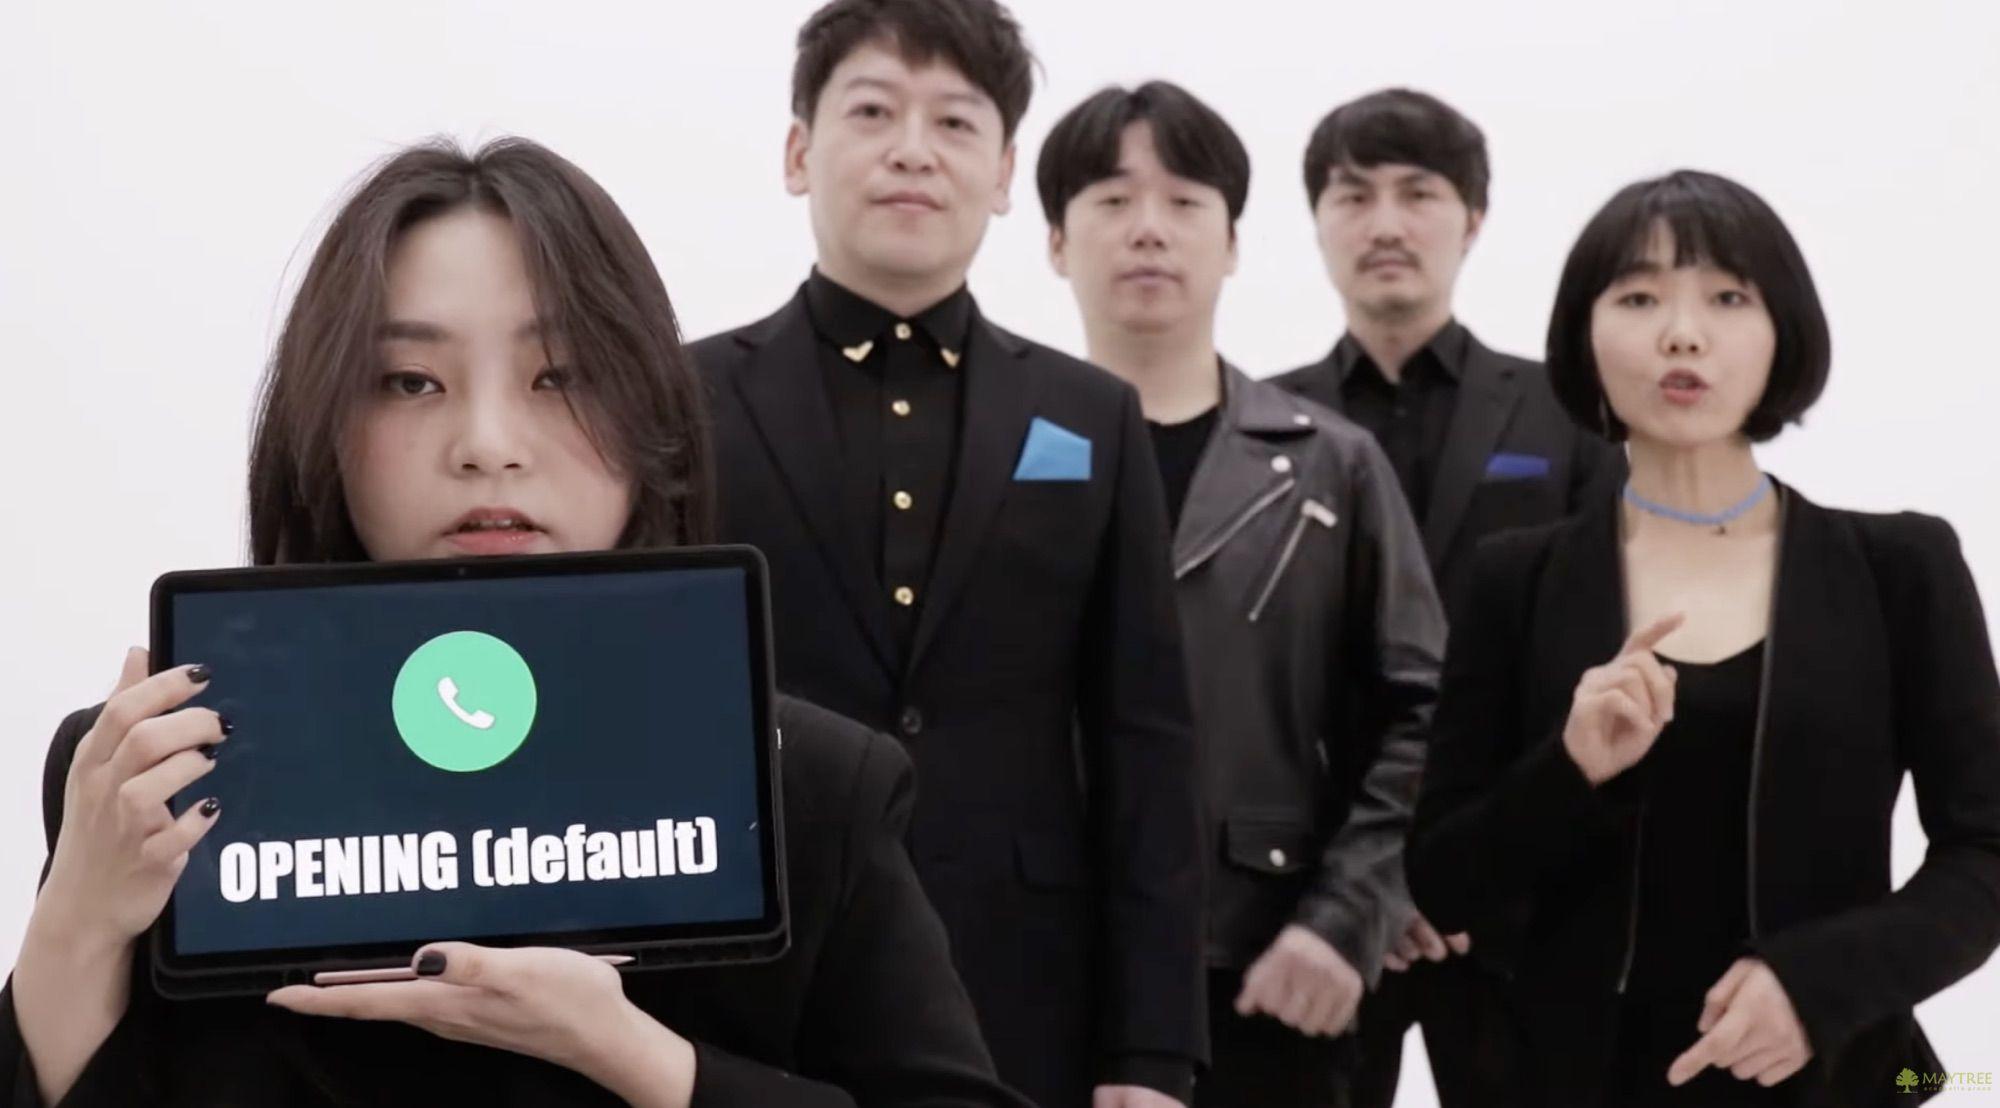 A Cappella Group Recreates Classic iPhone Ringtones